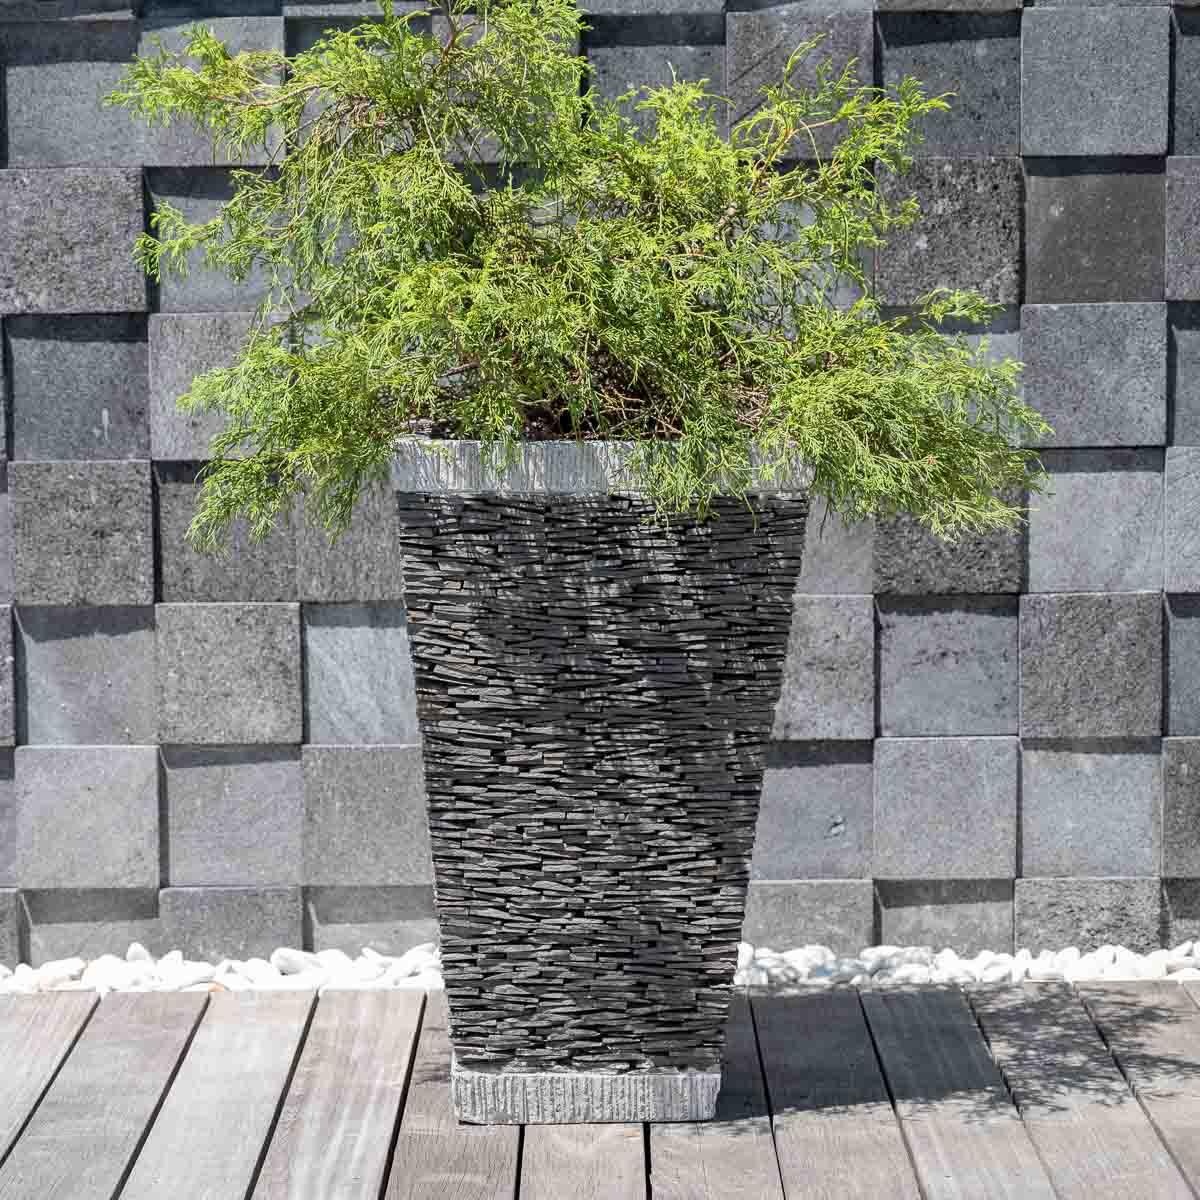 Wanda Collection Pot bac jardinière carré ardoise 80cm jardin terrasse pierre naturelle